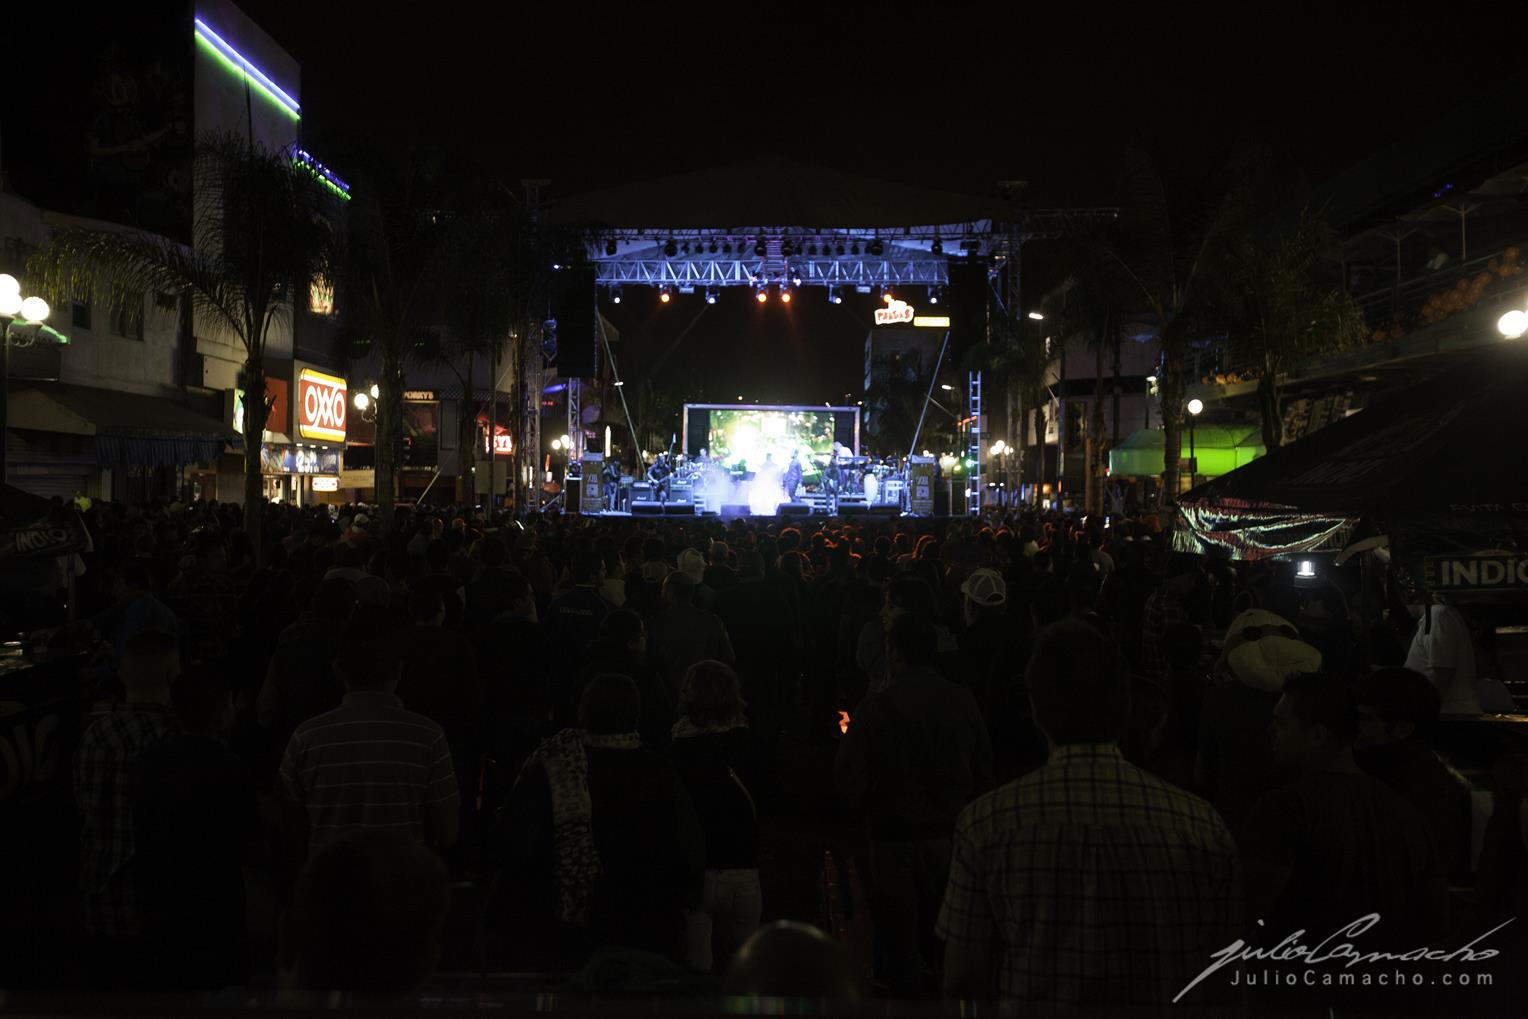 2014-10-30 31 CAST TOUR Ensenada y Tijuana - 1479 - www.Juli (Copy).jpg